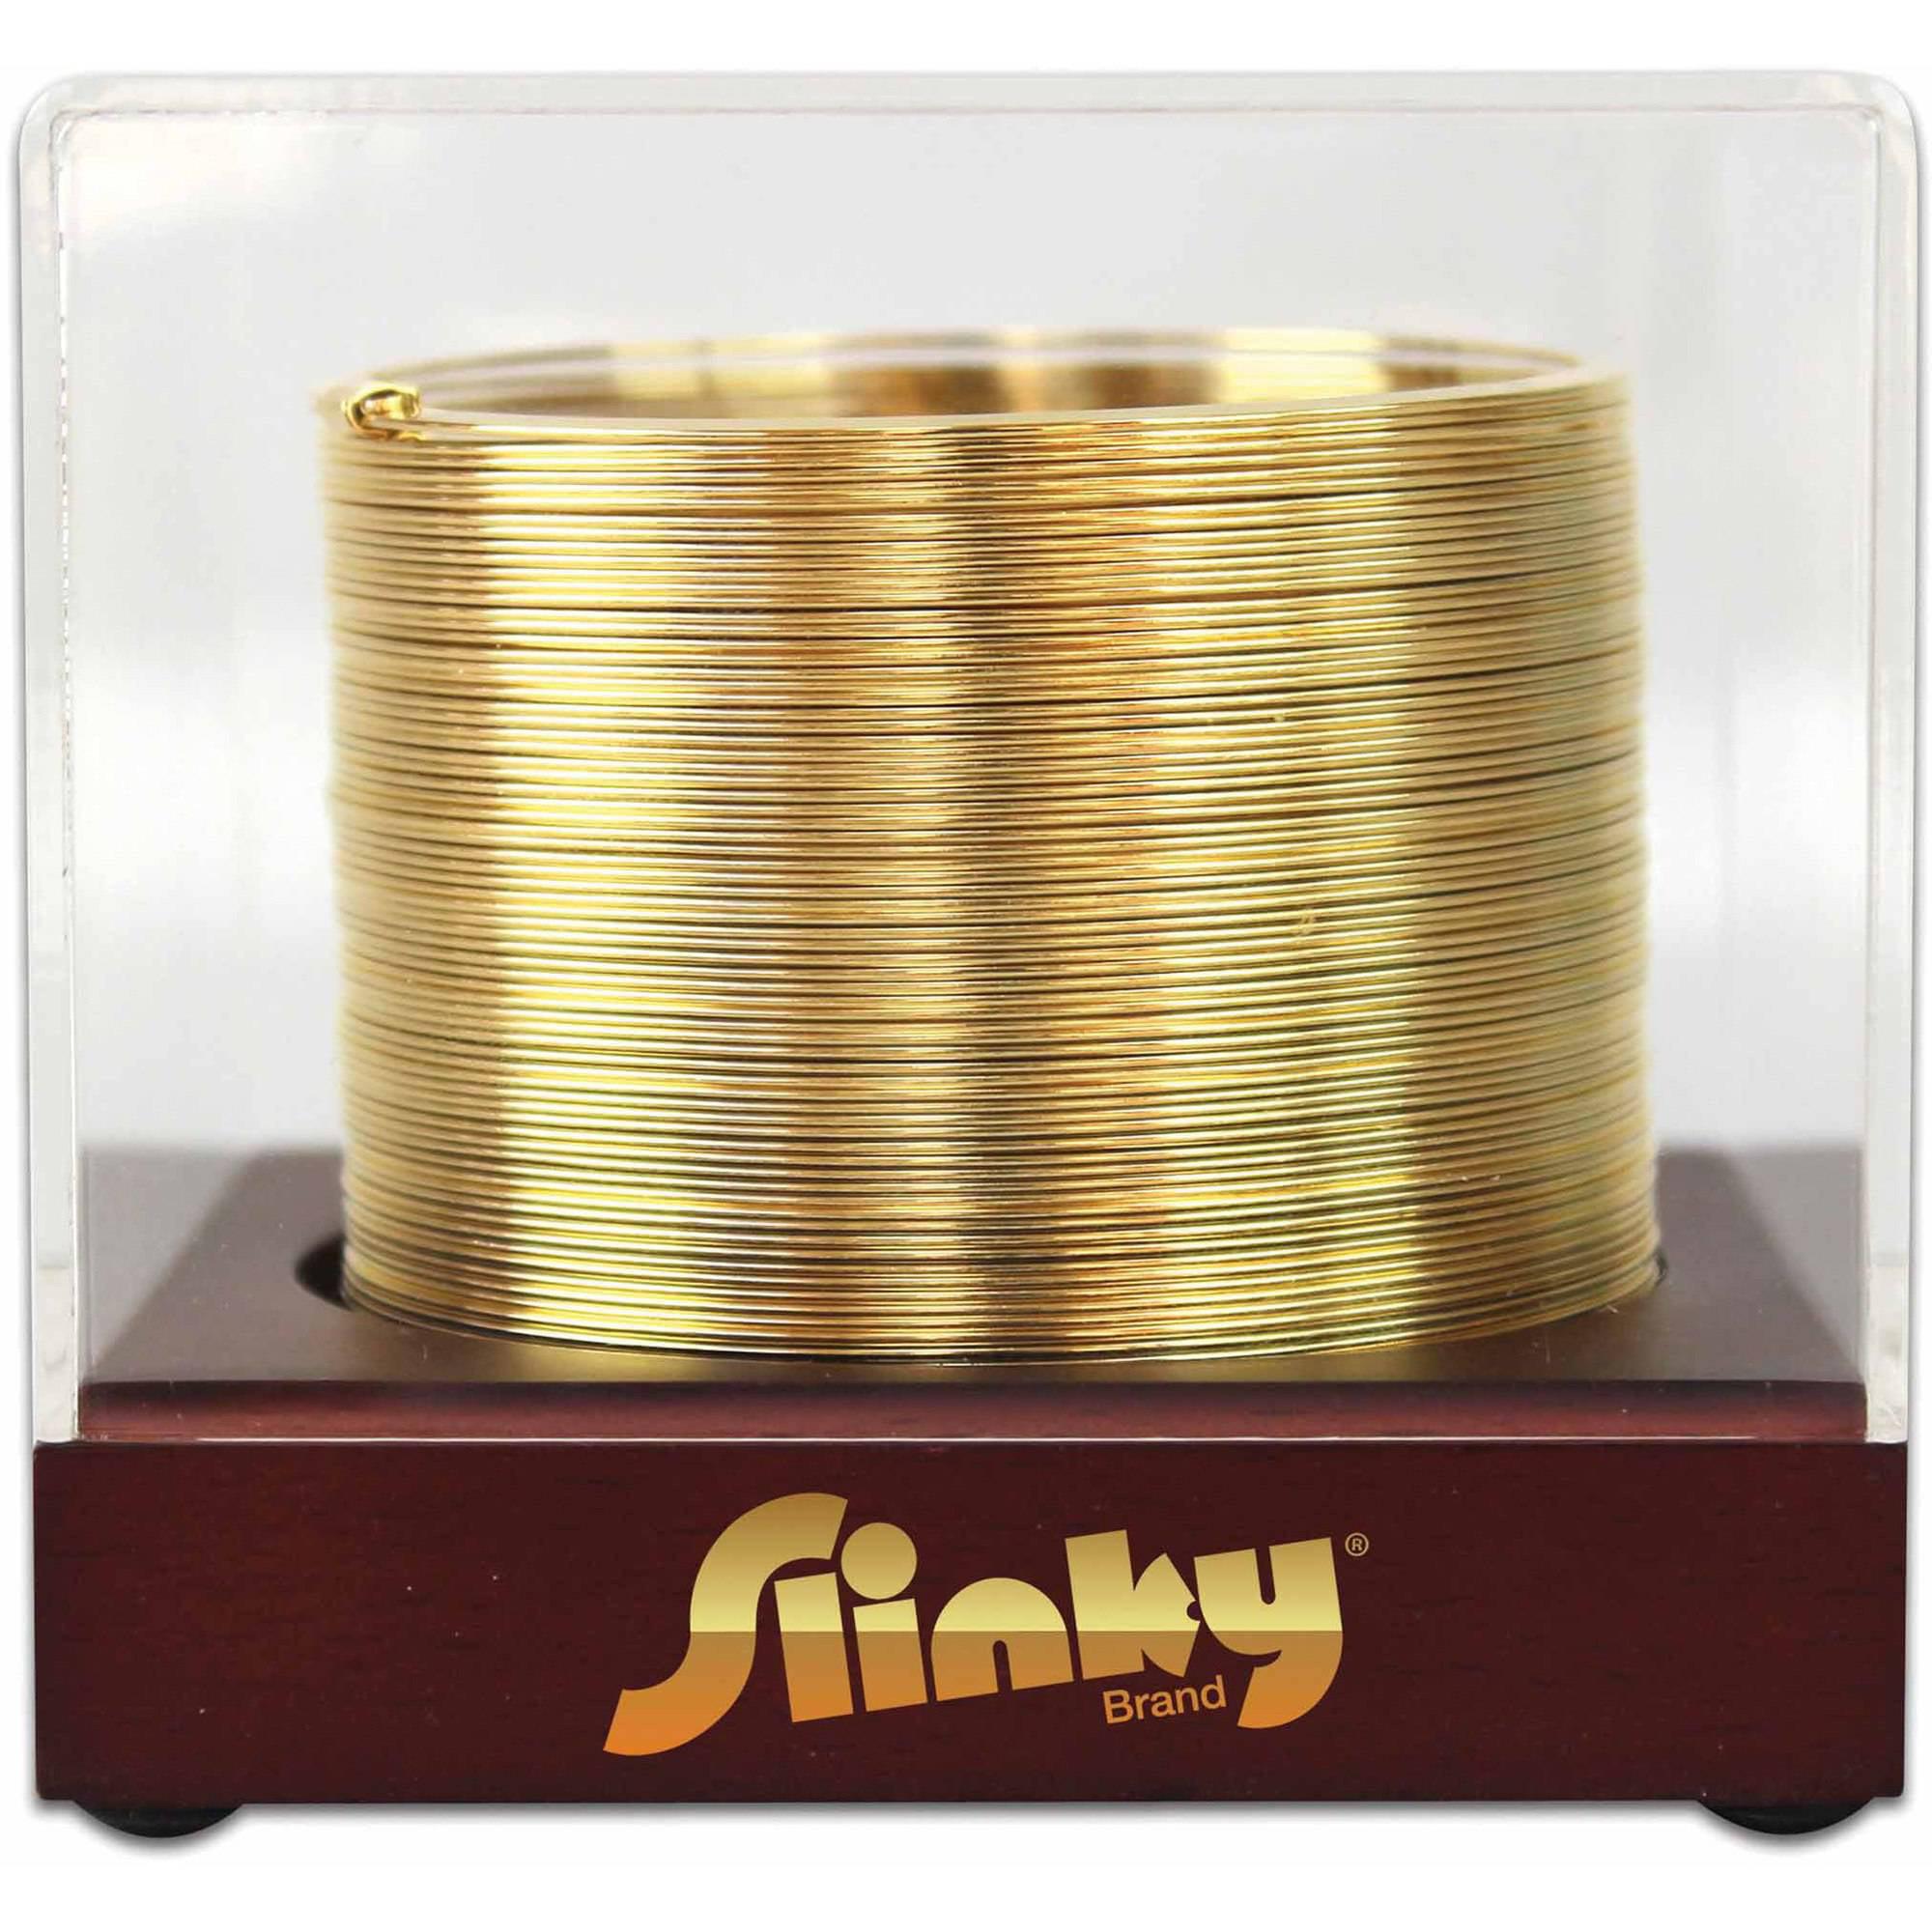 14-Karat Gold Plated Original Slinky